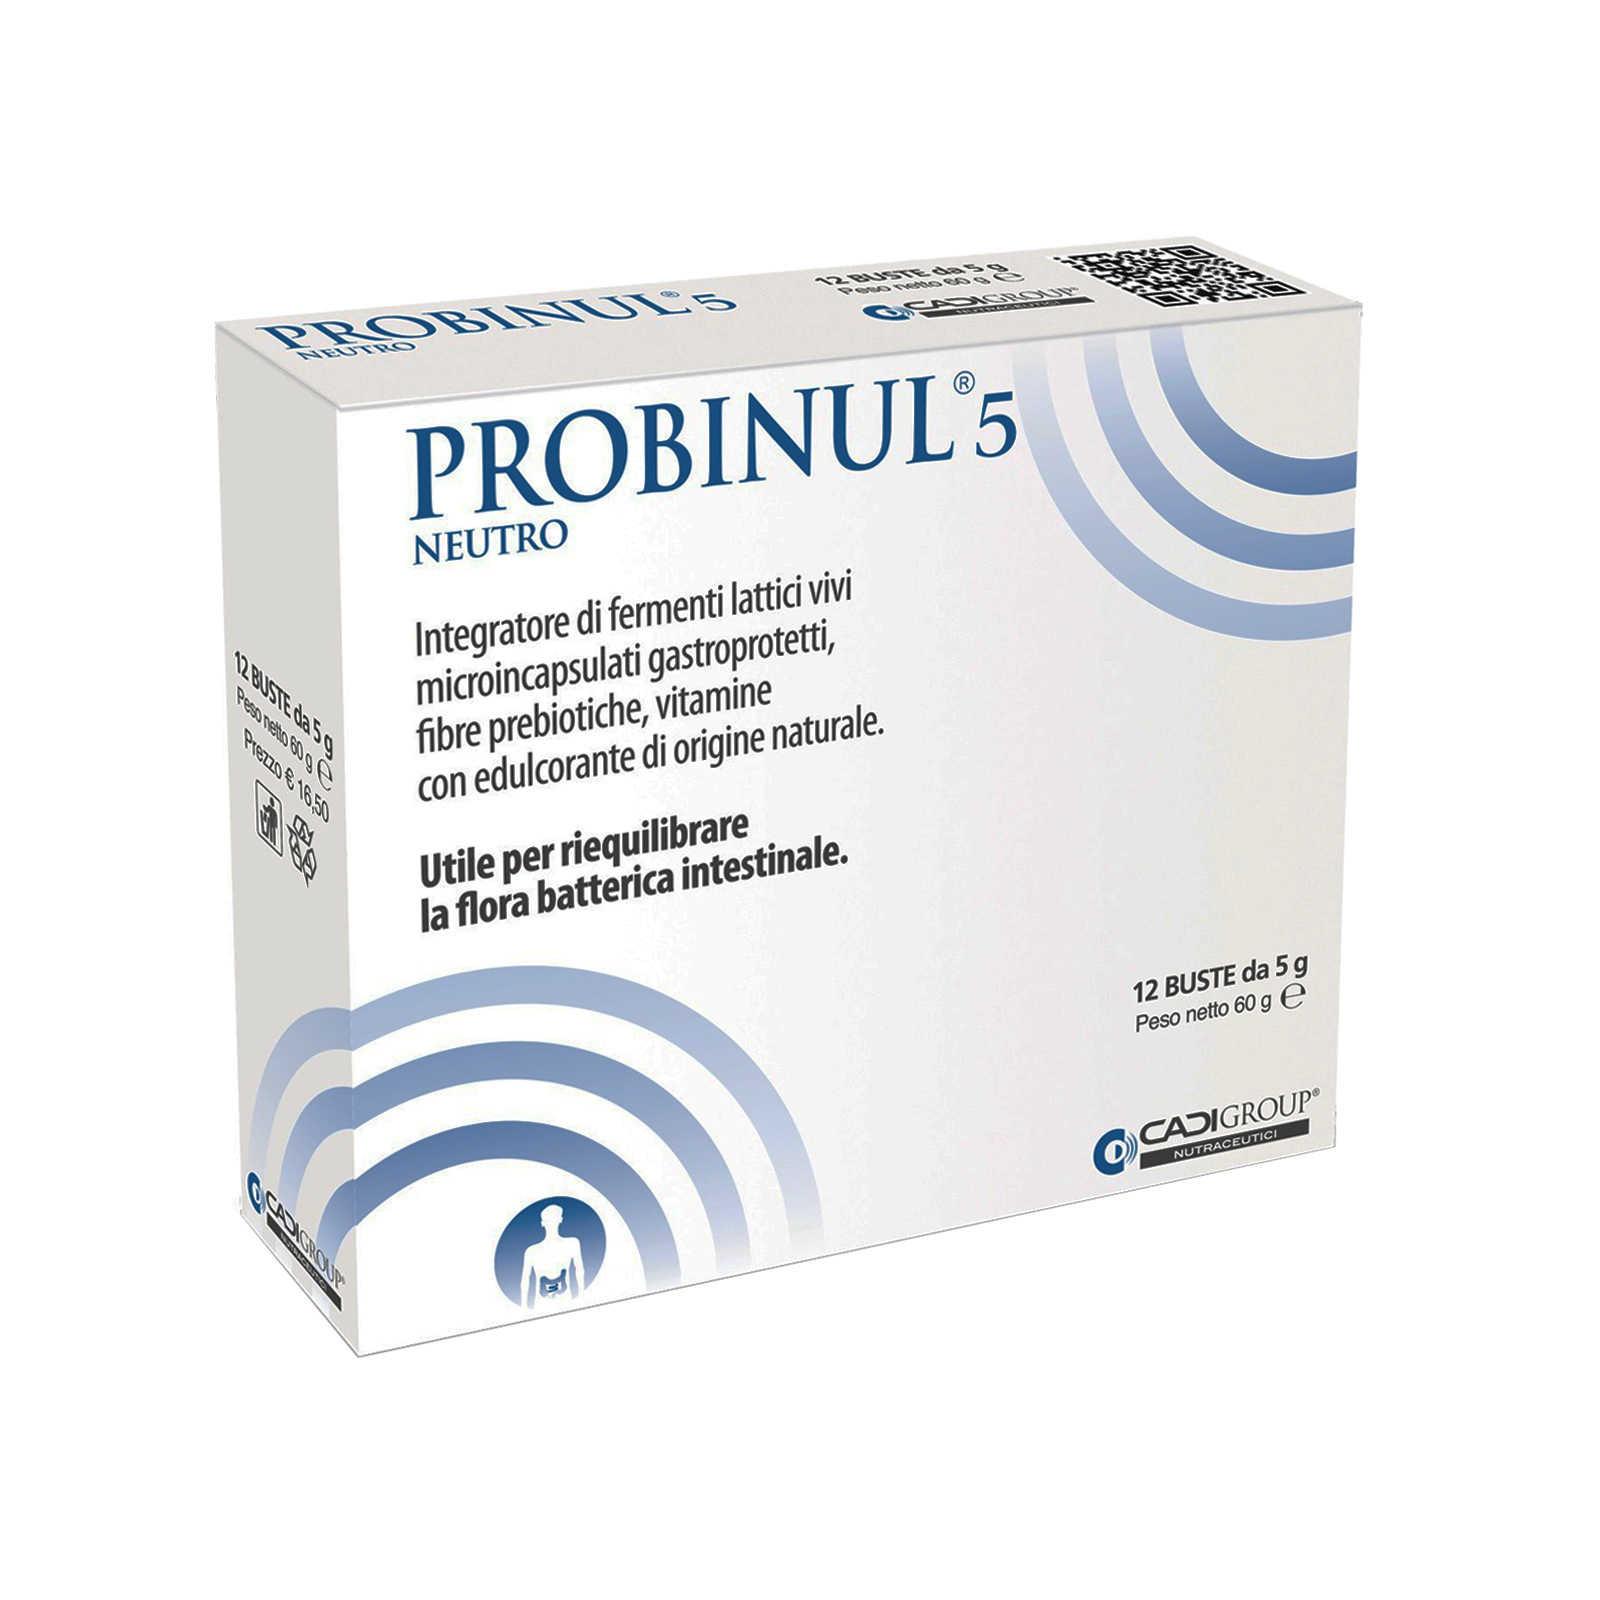 Probinul - 5 - Neutro